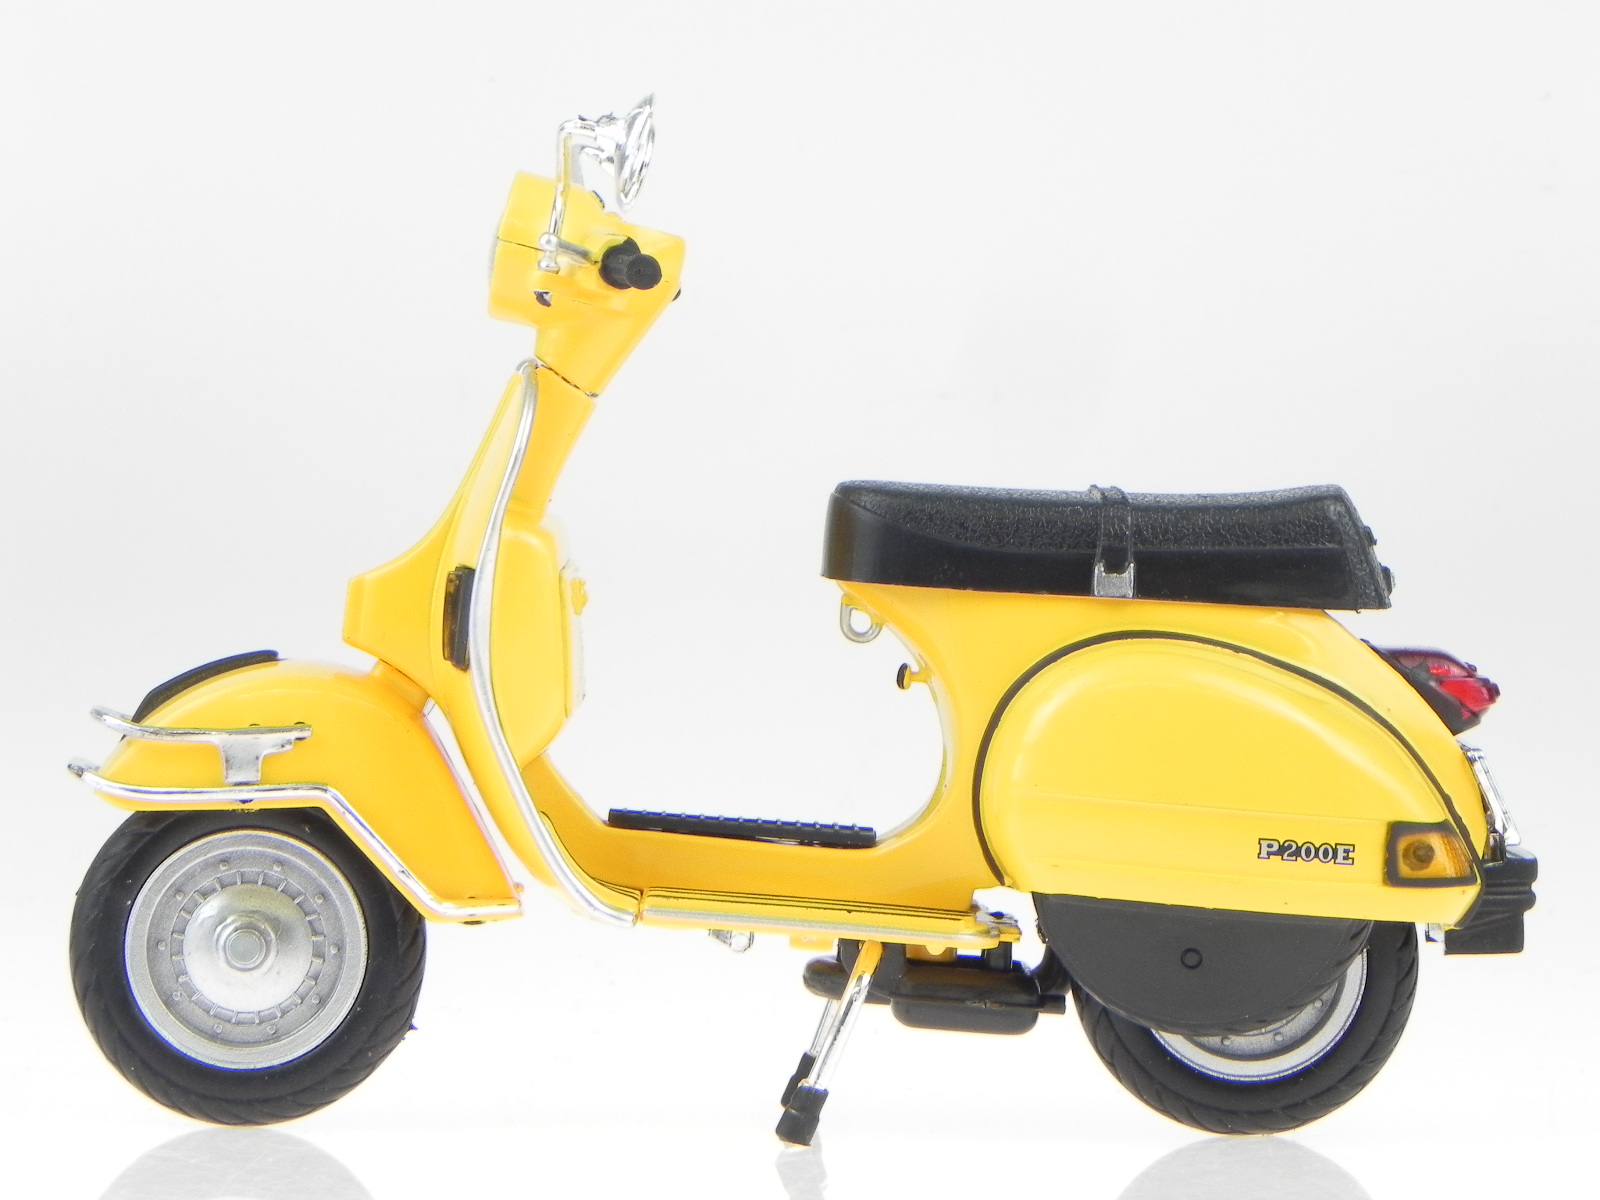 vespa p 200 e px 1978 yellow metall modell 42123 newray 1 12 4058124220589 ebay. Black Bedroom Furniture Sets. Home Design Ideas